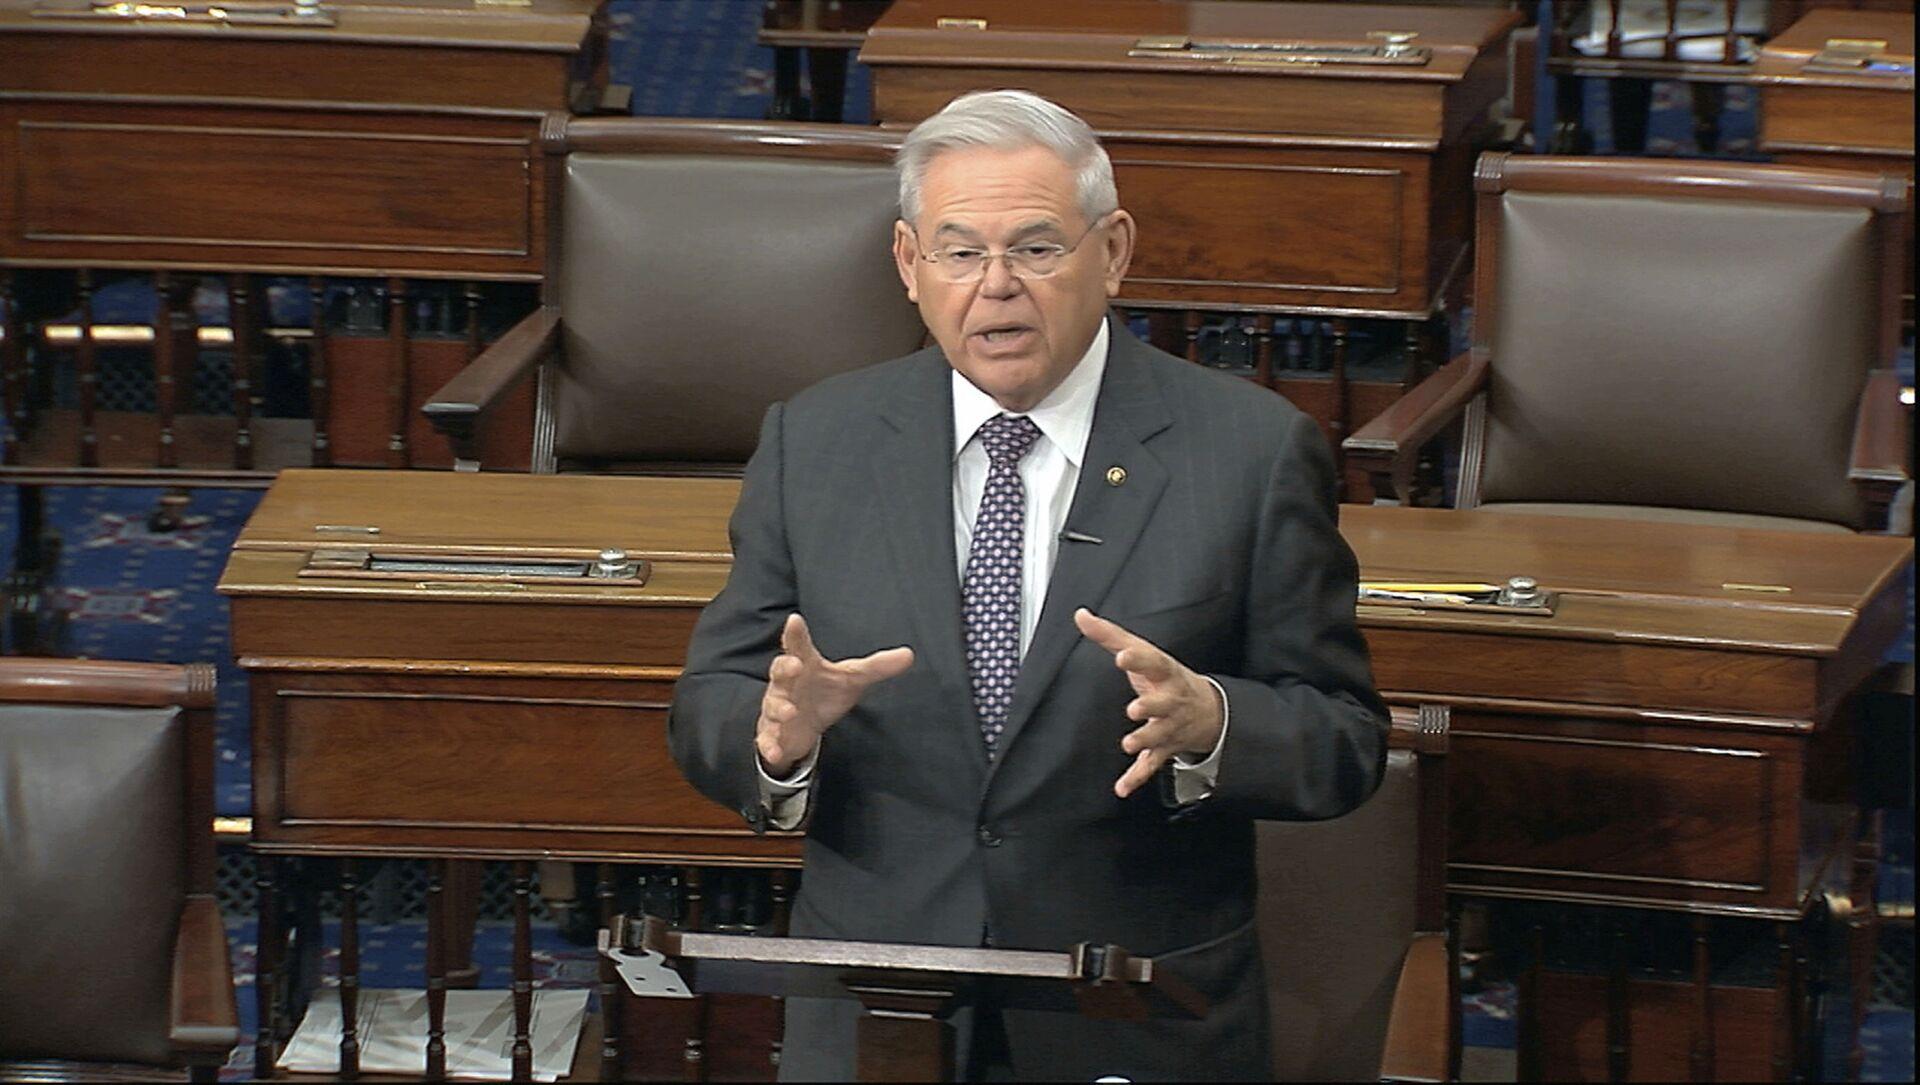 In this image from video, Sen. Robert Menendez, D-N.J., speaks on the Senate floor at the U.S. Capitol in Washington, Tuesday, March 17, 2020. - Sputnik International, 1920, 05.08.2021